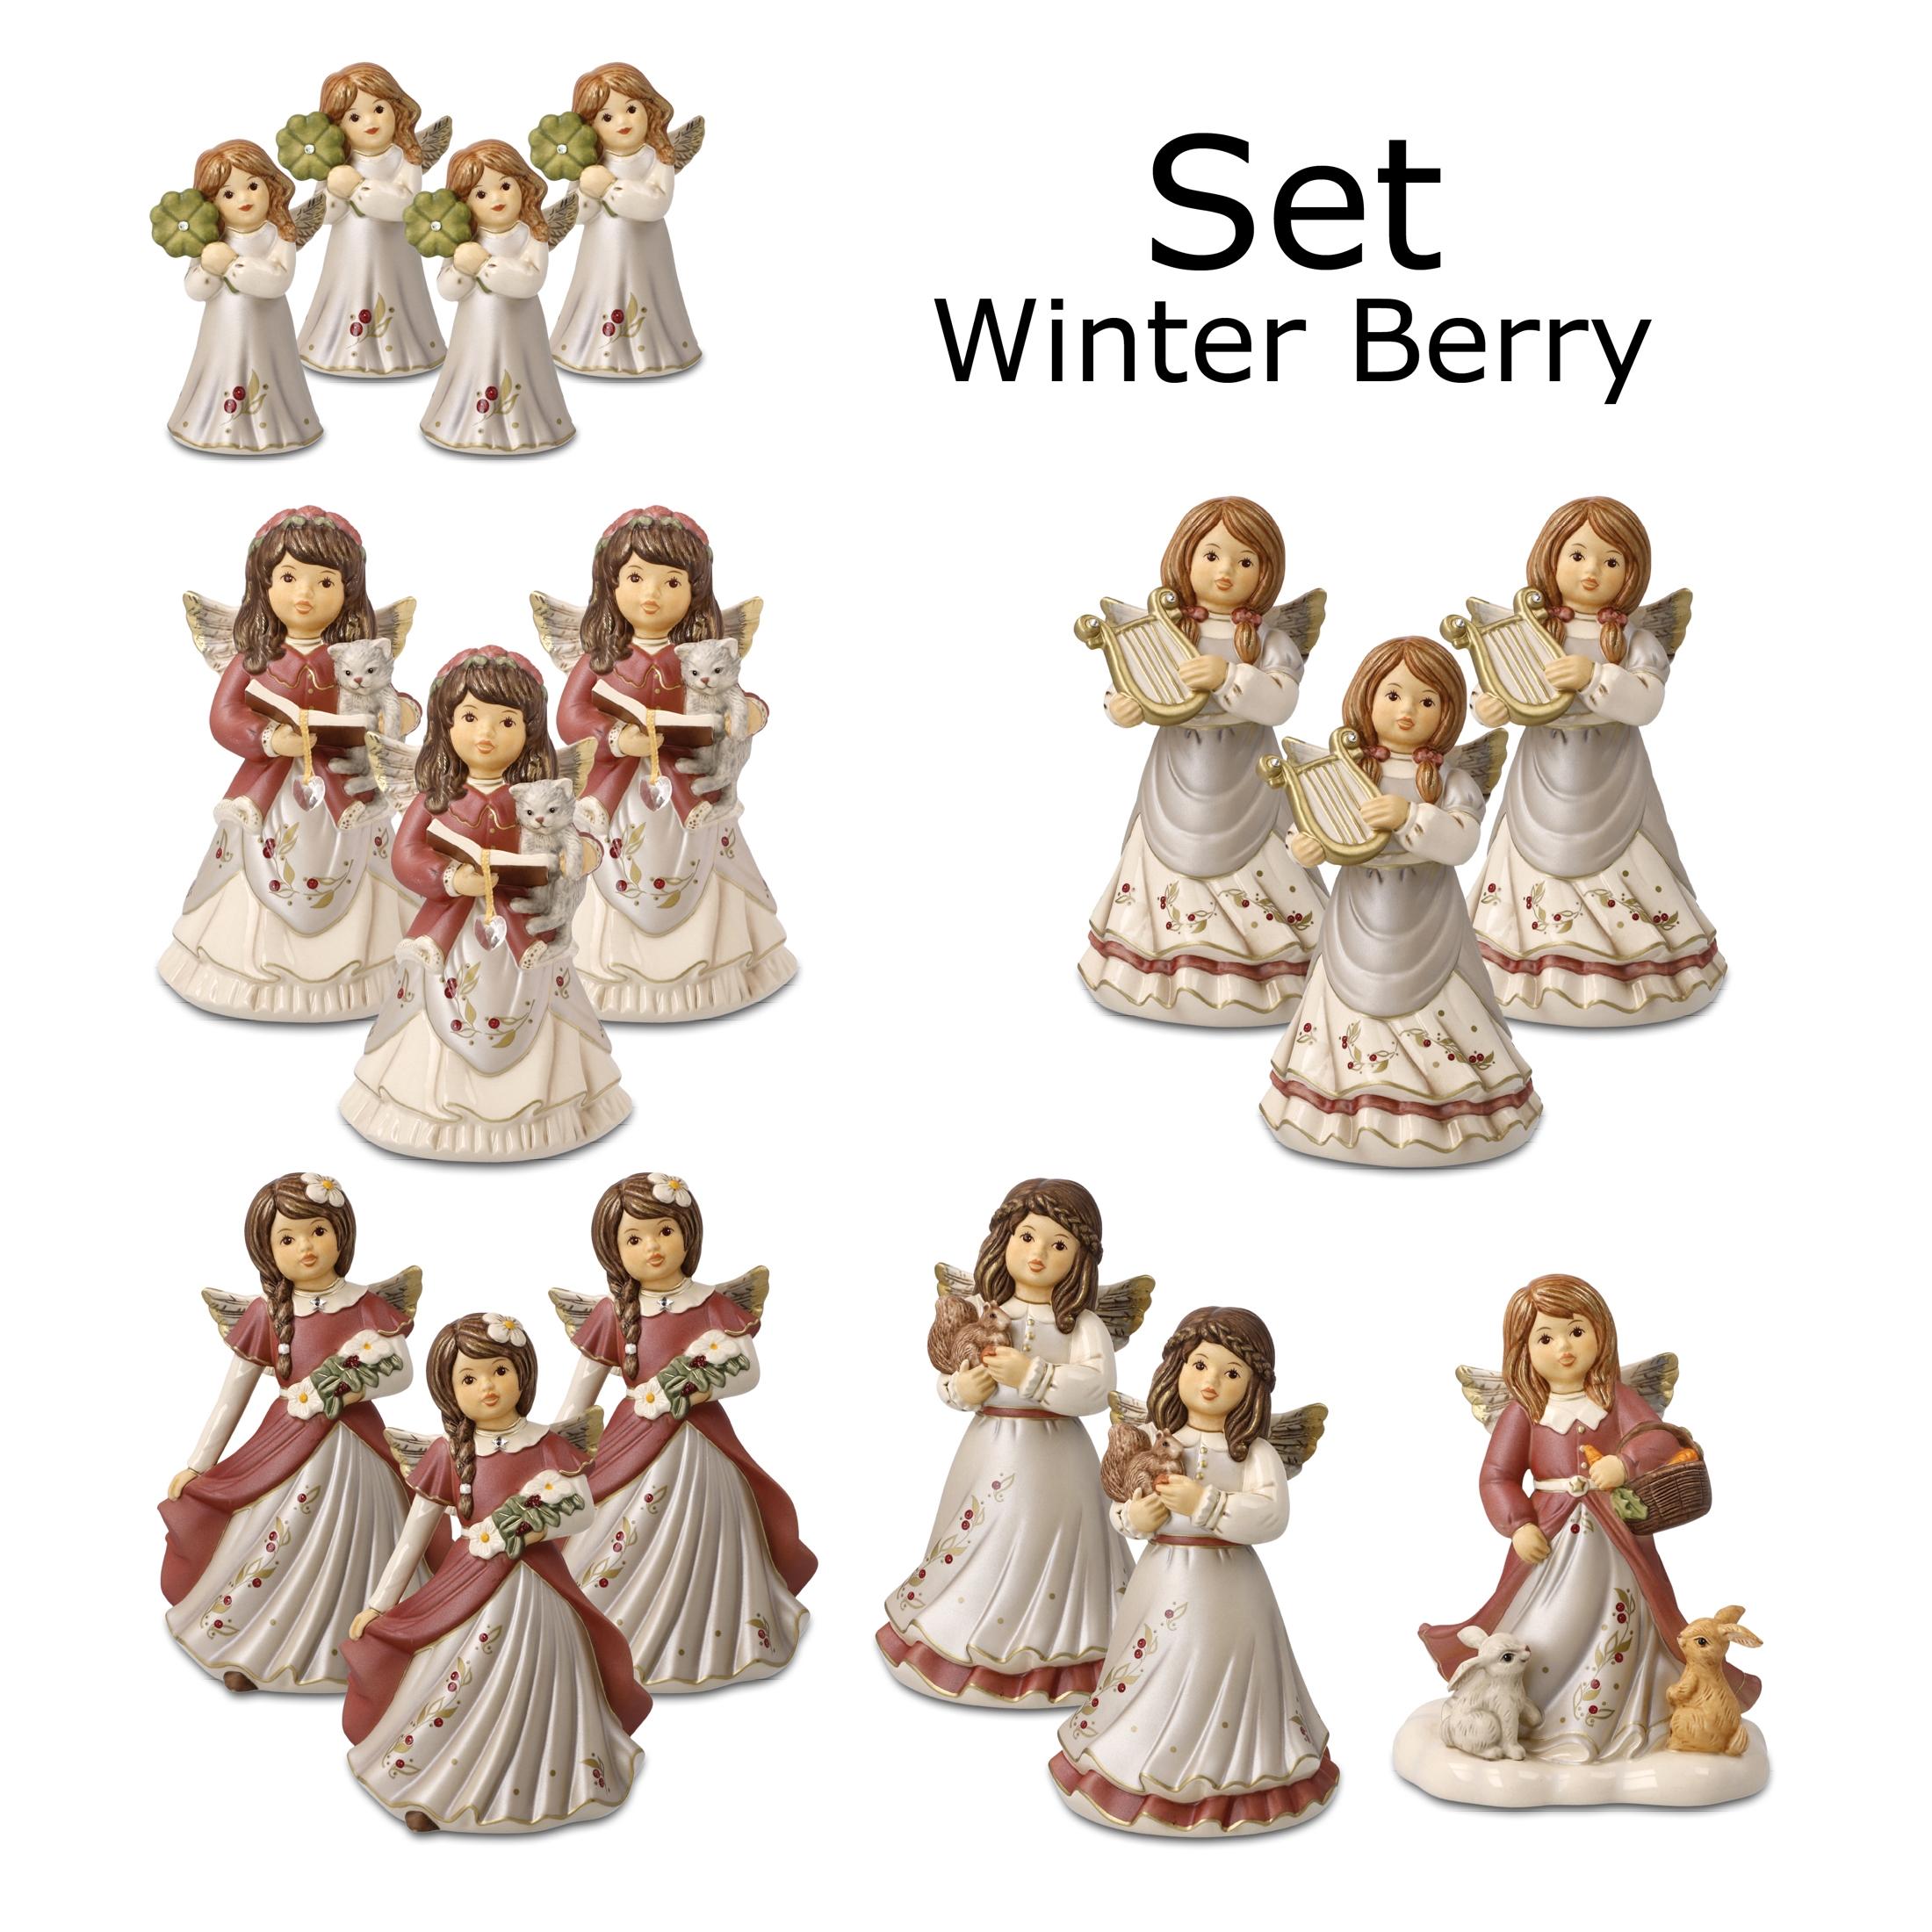 Goebel Weihnachten Winter Berry 'XM S Set JF Winter Berry 2021 16 tlg' 2021 !